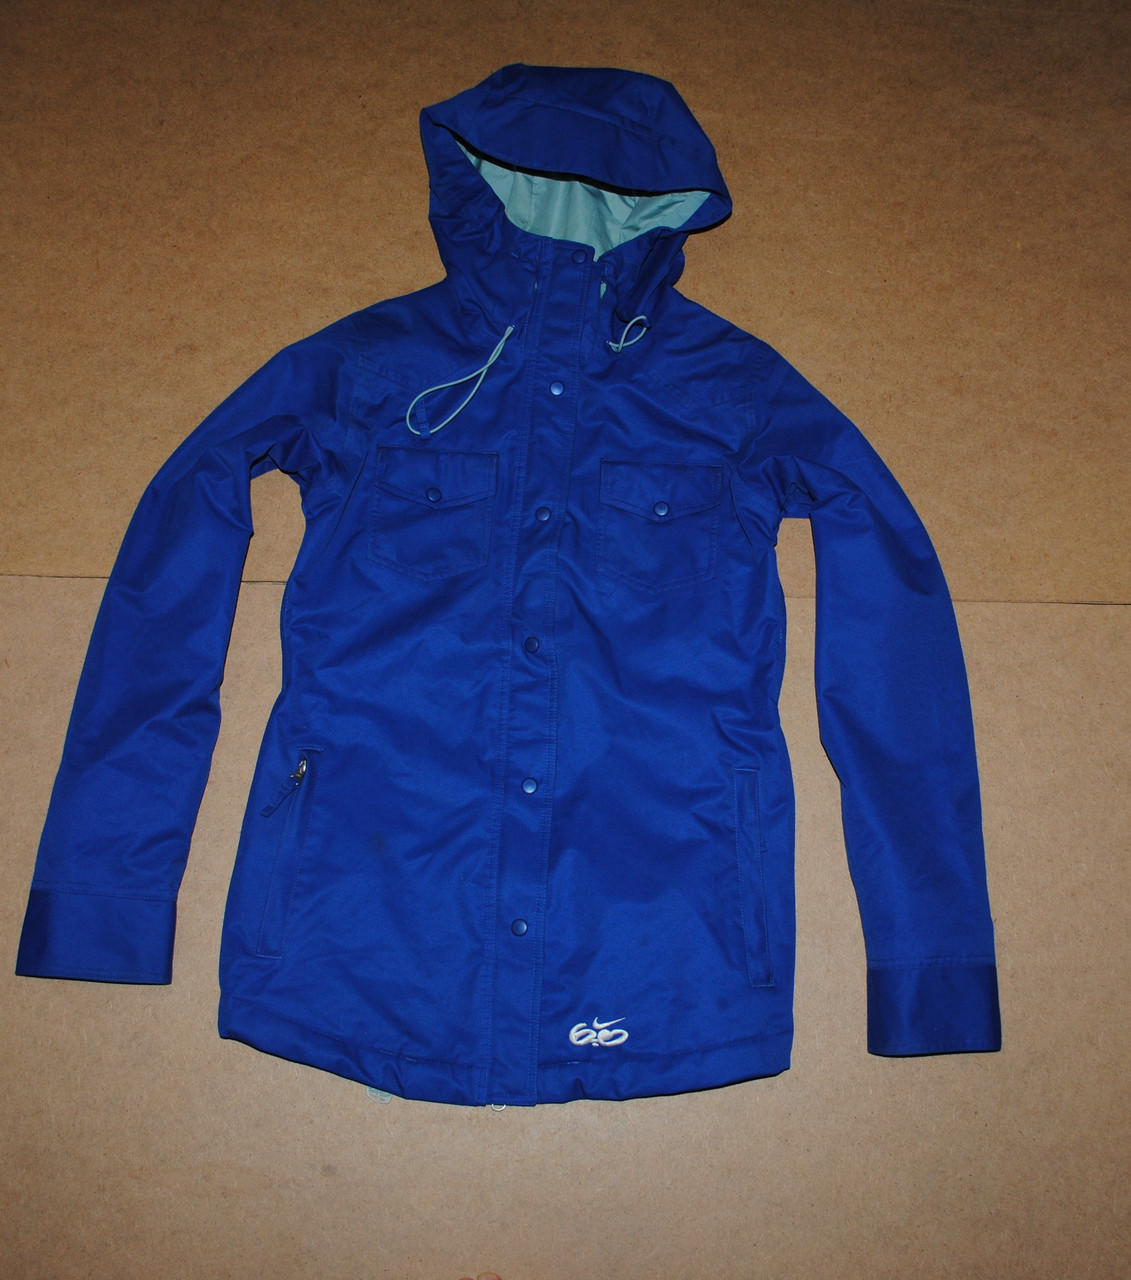 1ae99f9d Nike 6.0 теплая горнолыжная куртка, оригинал - ilya1grand в Полтаве